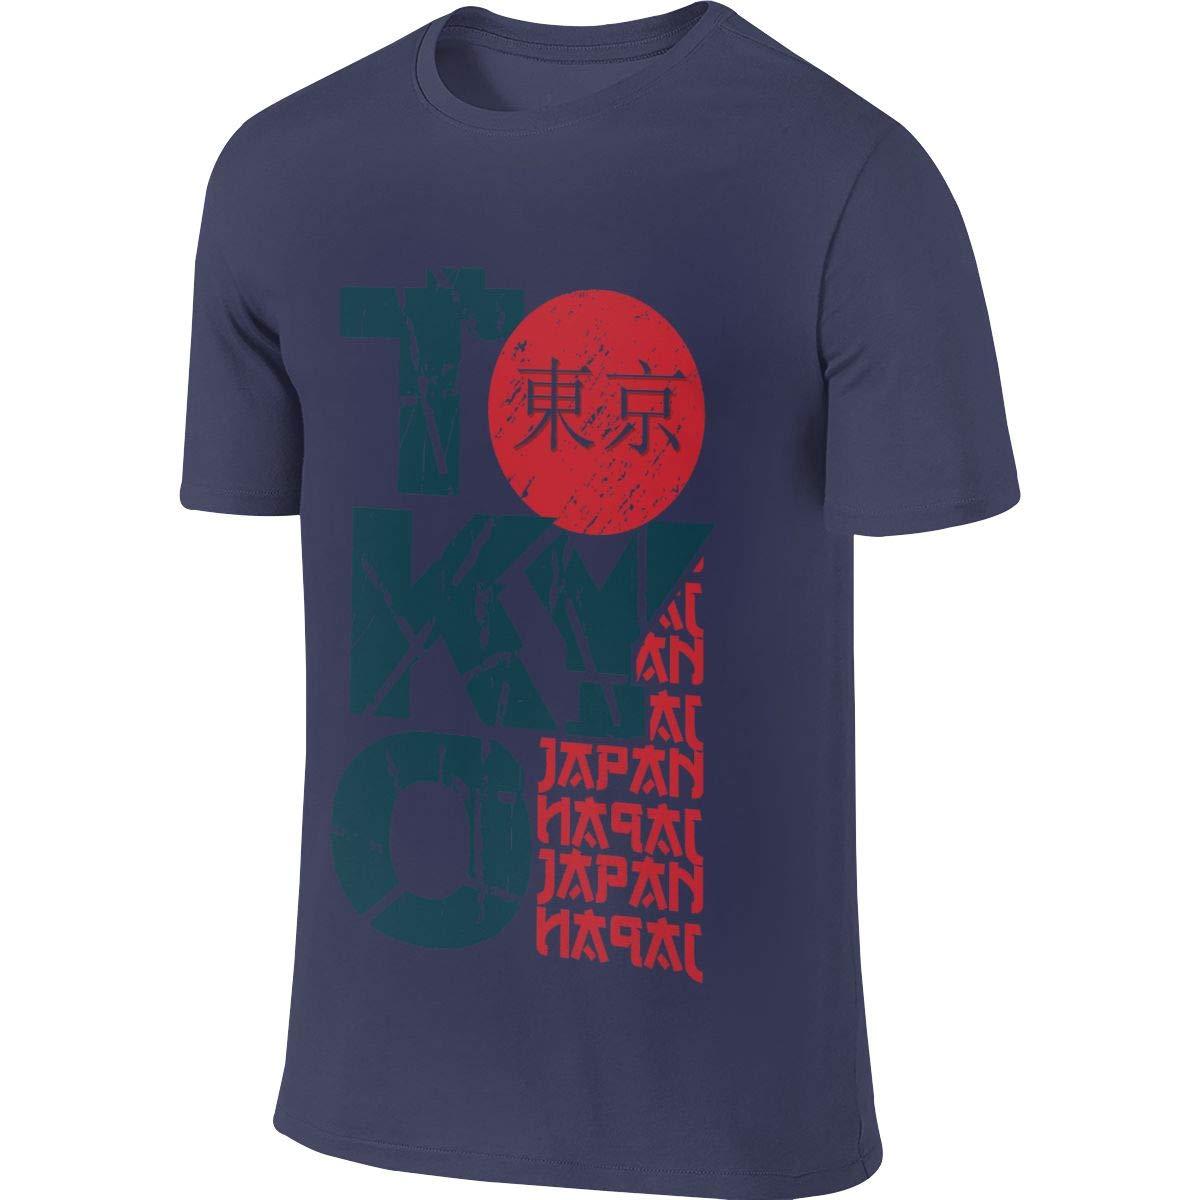 STDONE Man Customized Humor Tee Tokyo Japan Print Tshirts